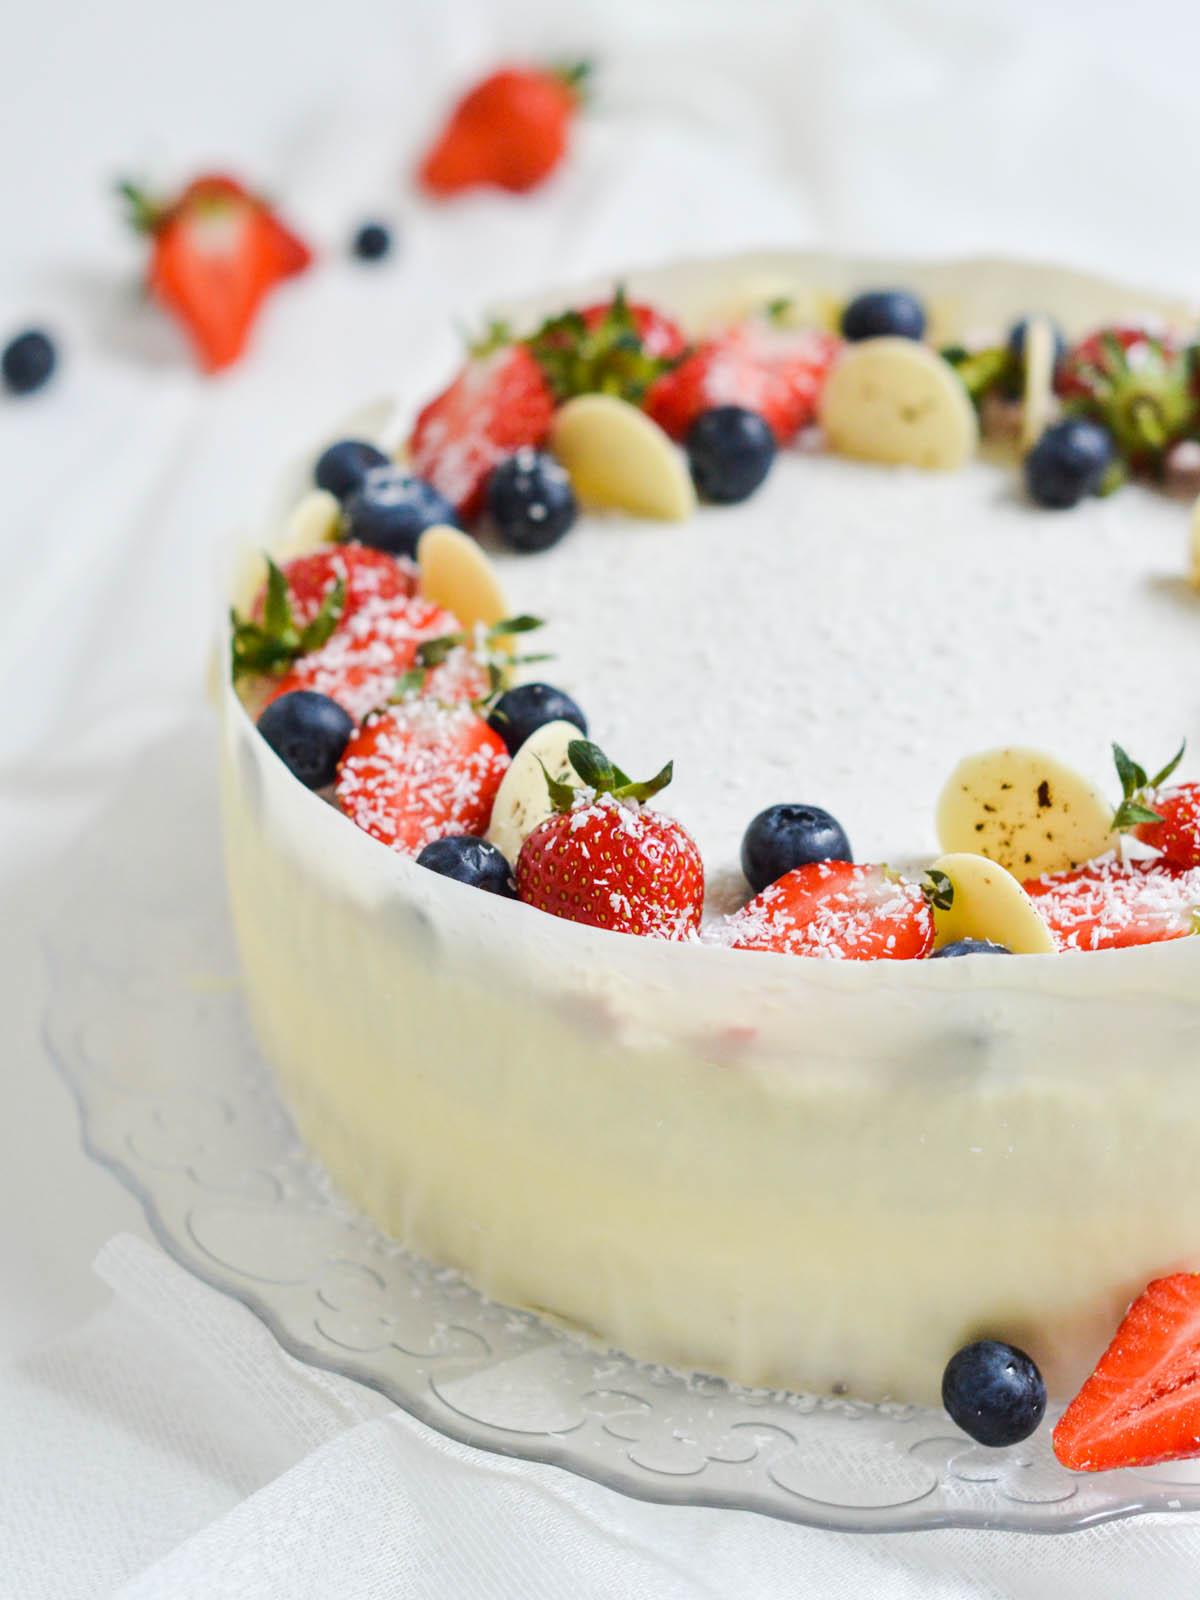 mousse torta s jagodama i kokosom (2)